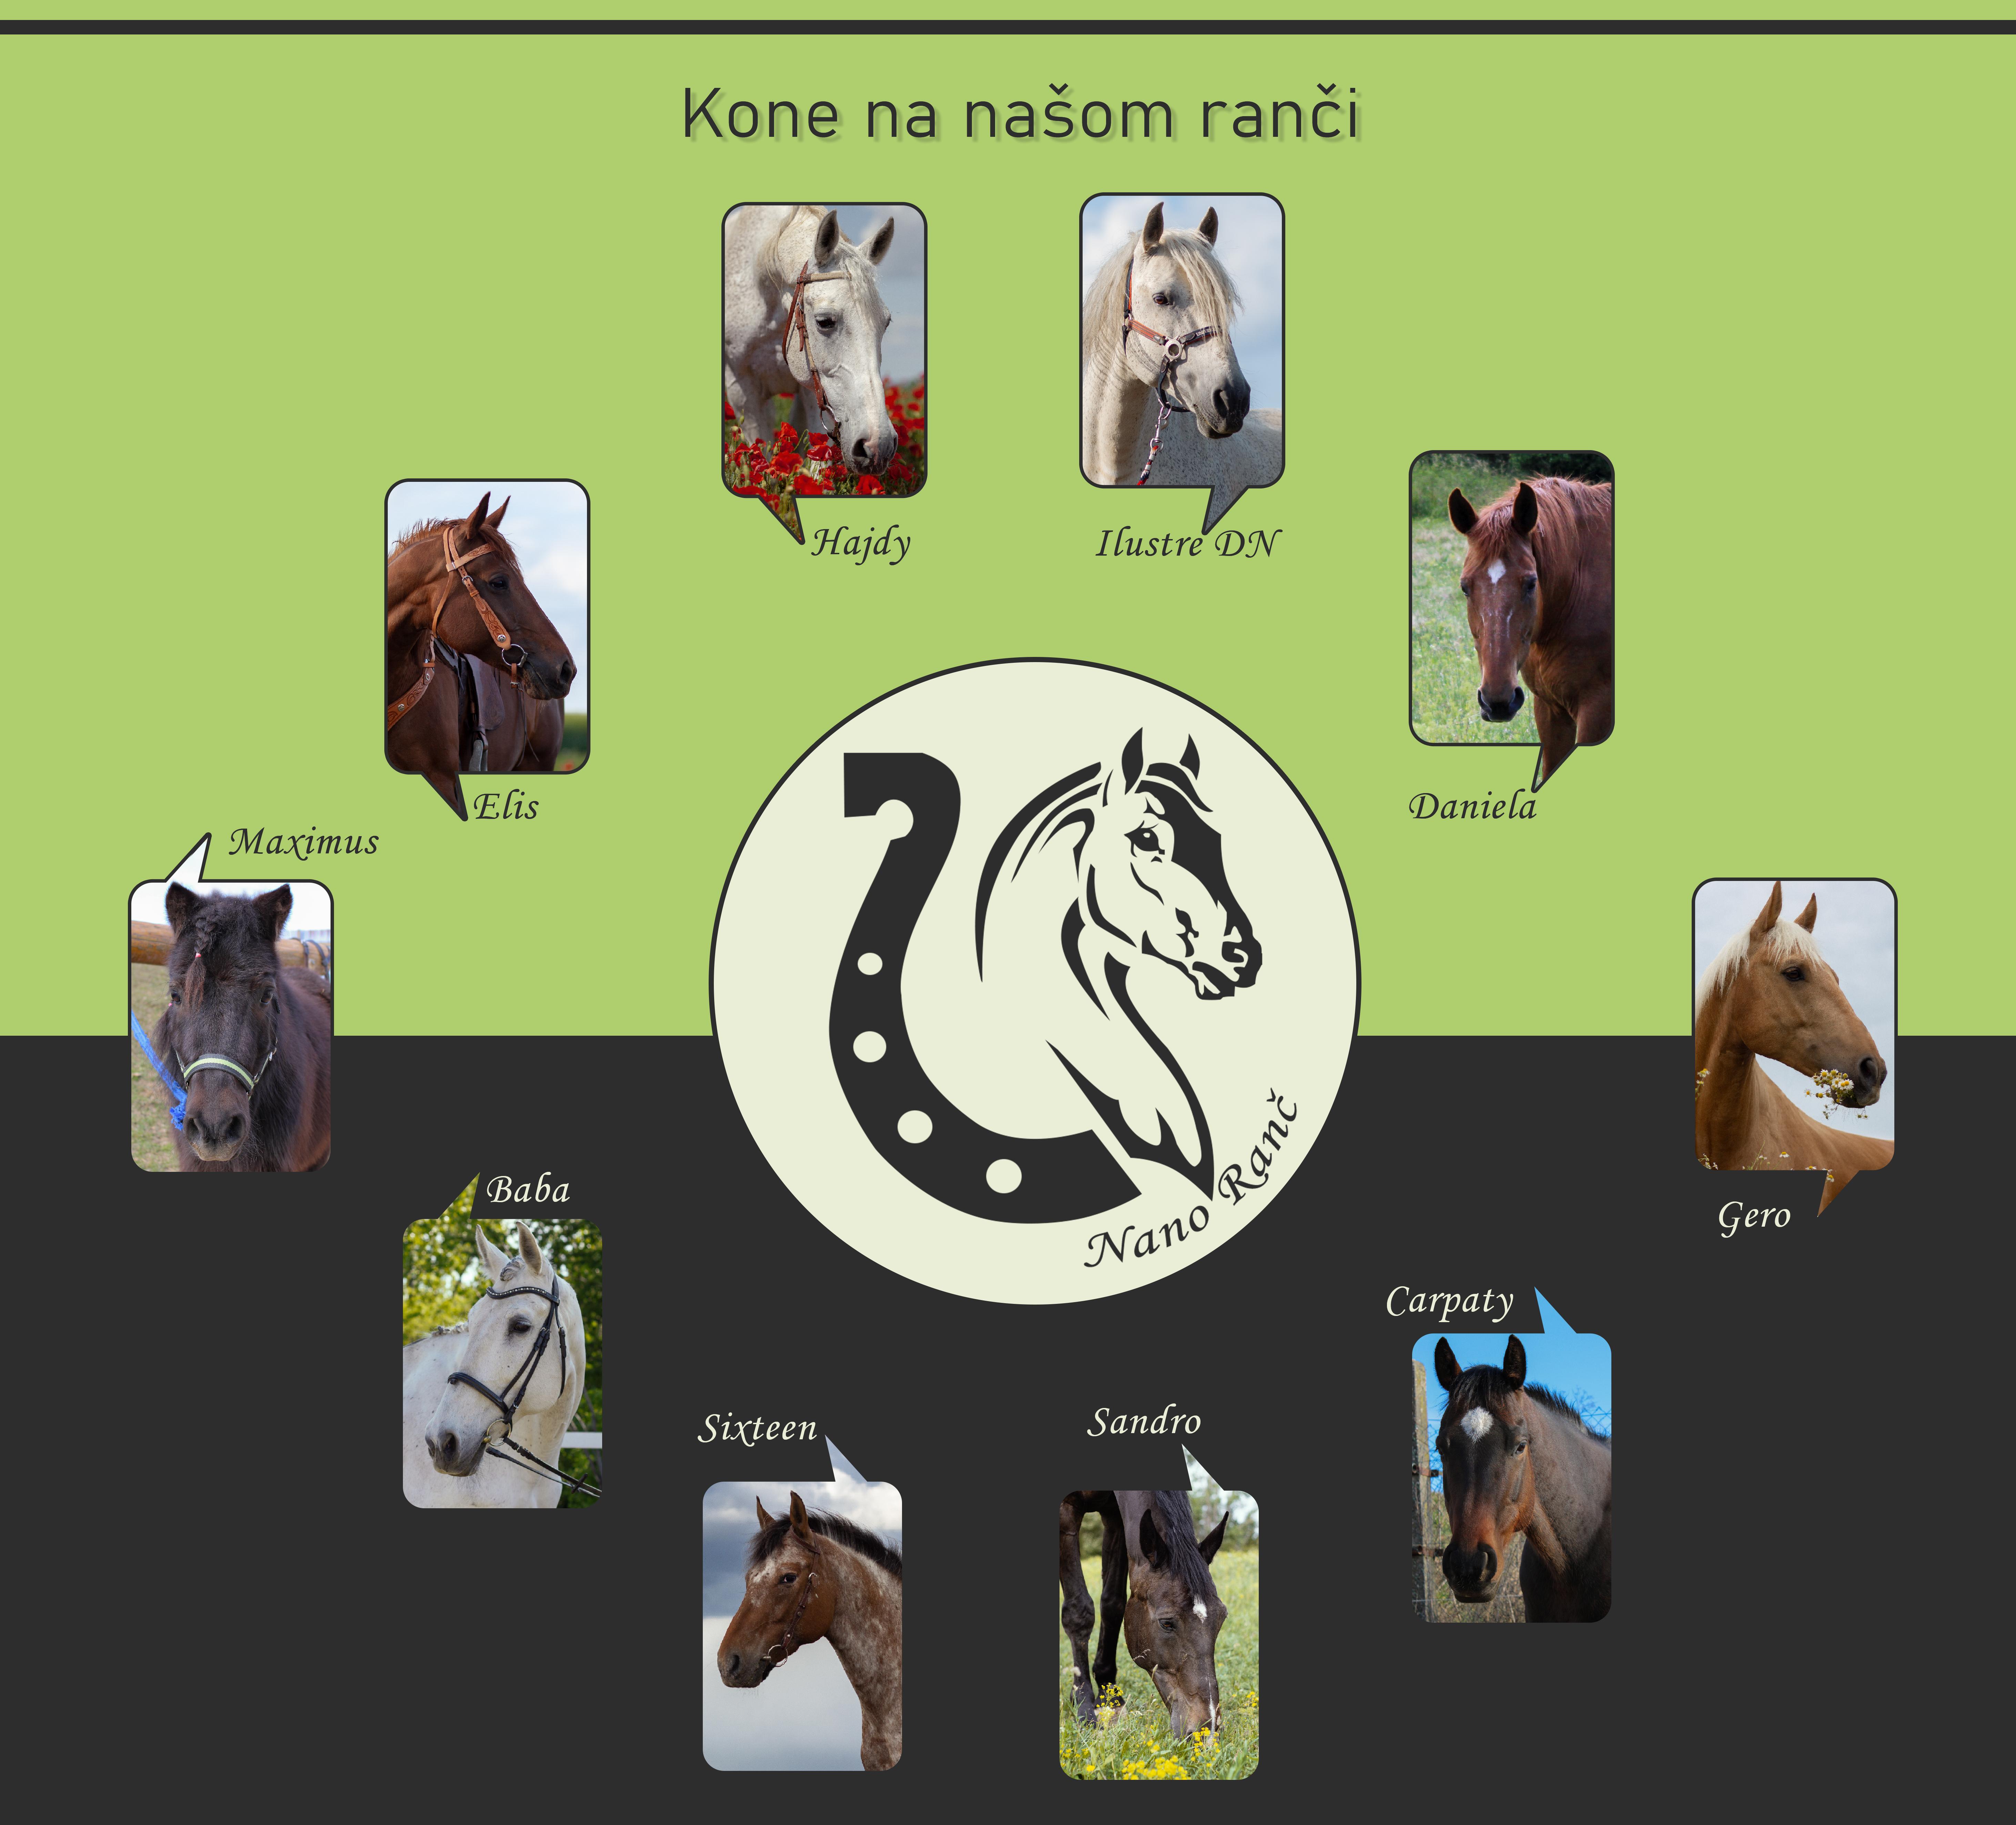 kone_na_ranči2